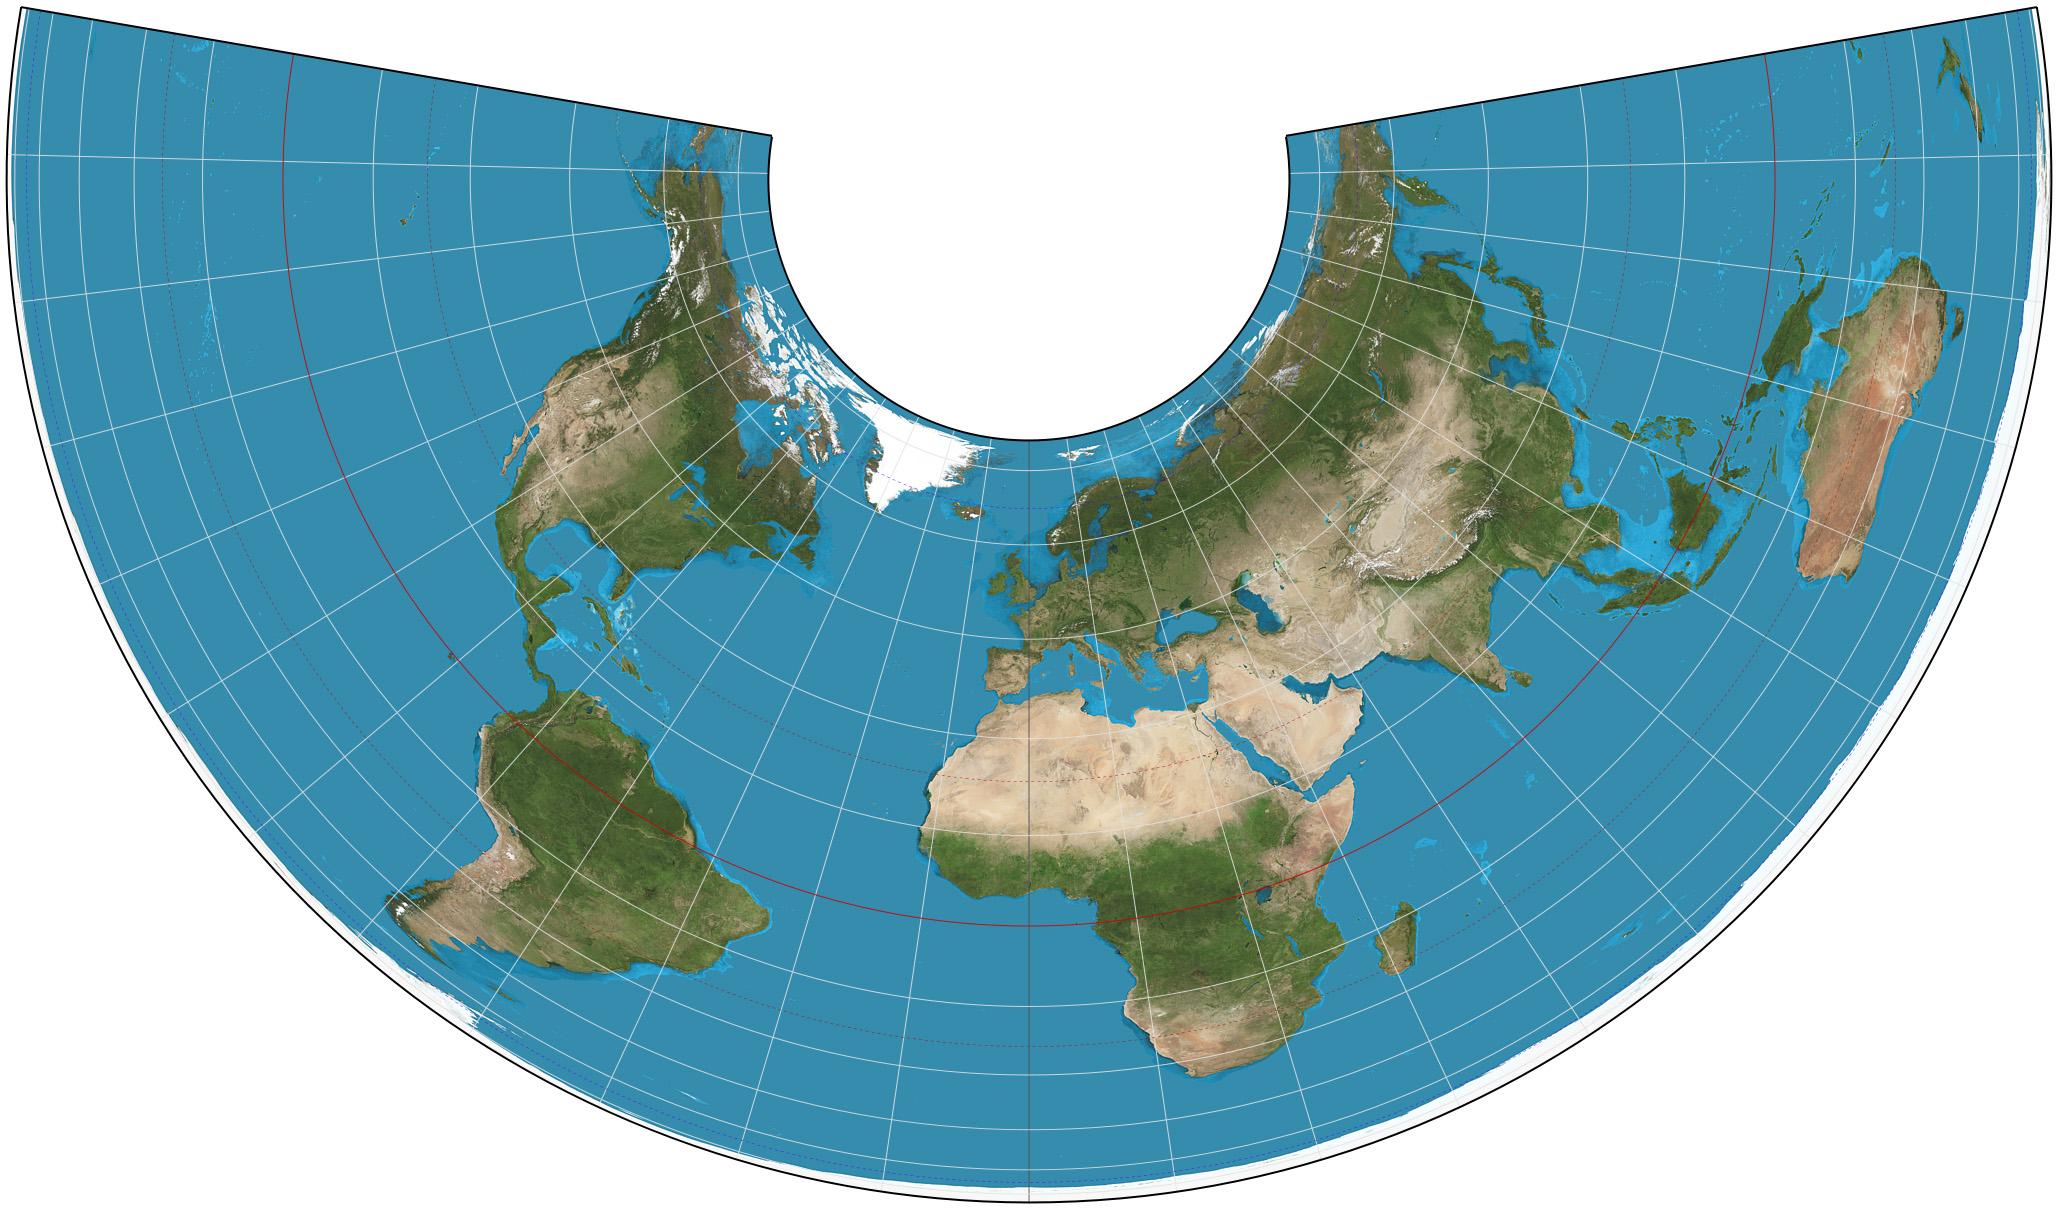 worksheet Planet Earth Pole To Pole Worksheet worksheet preview by robert passer lemaster blended worksheets map variety